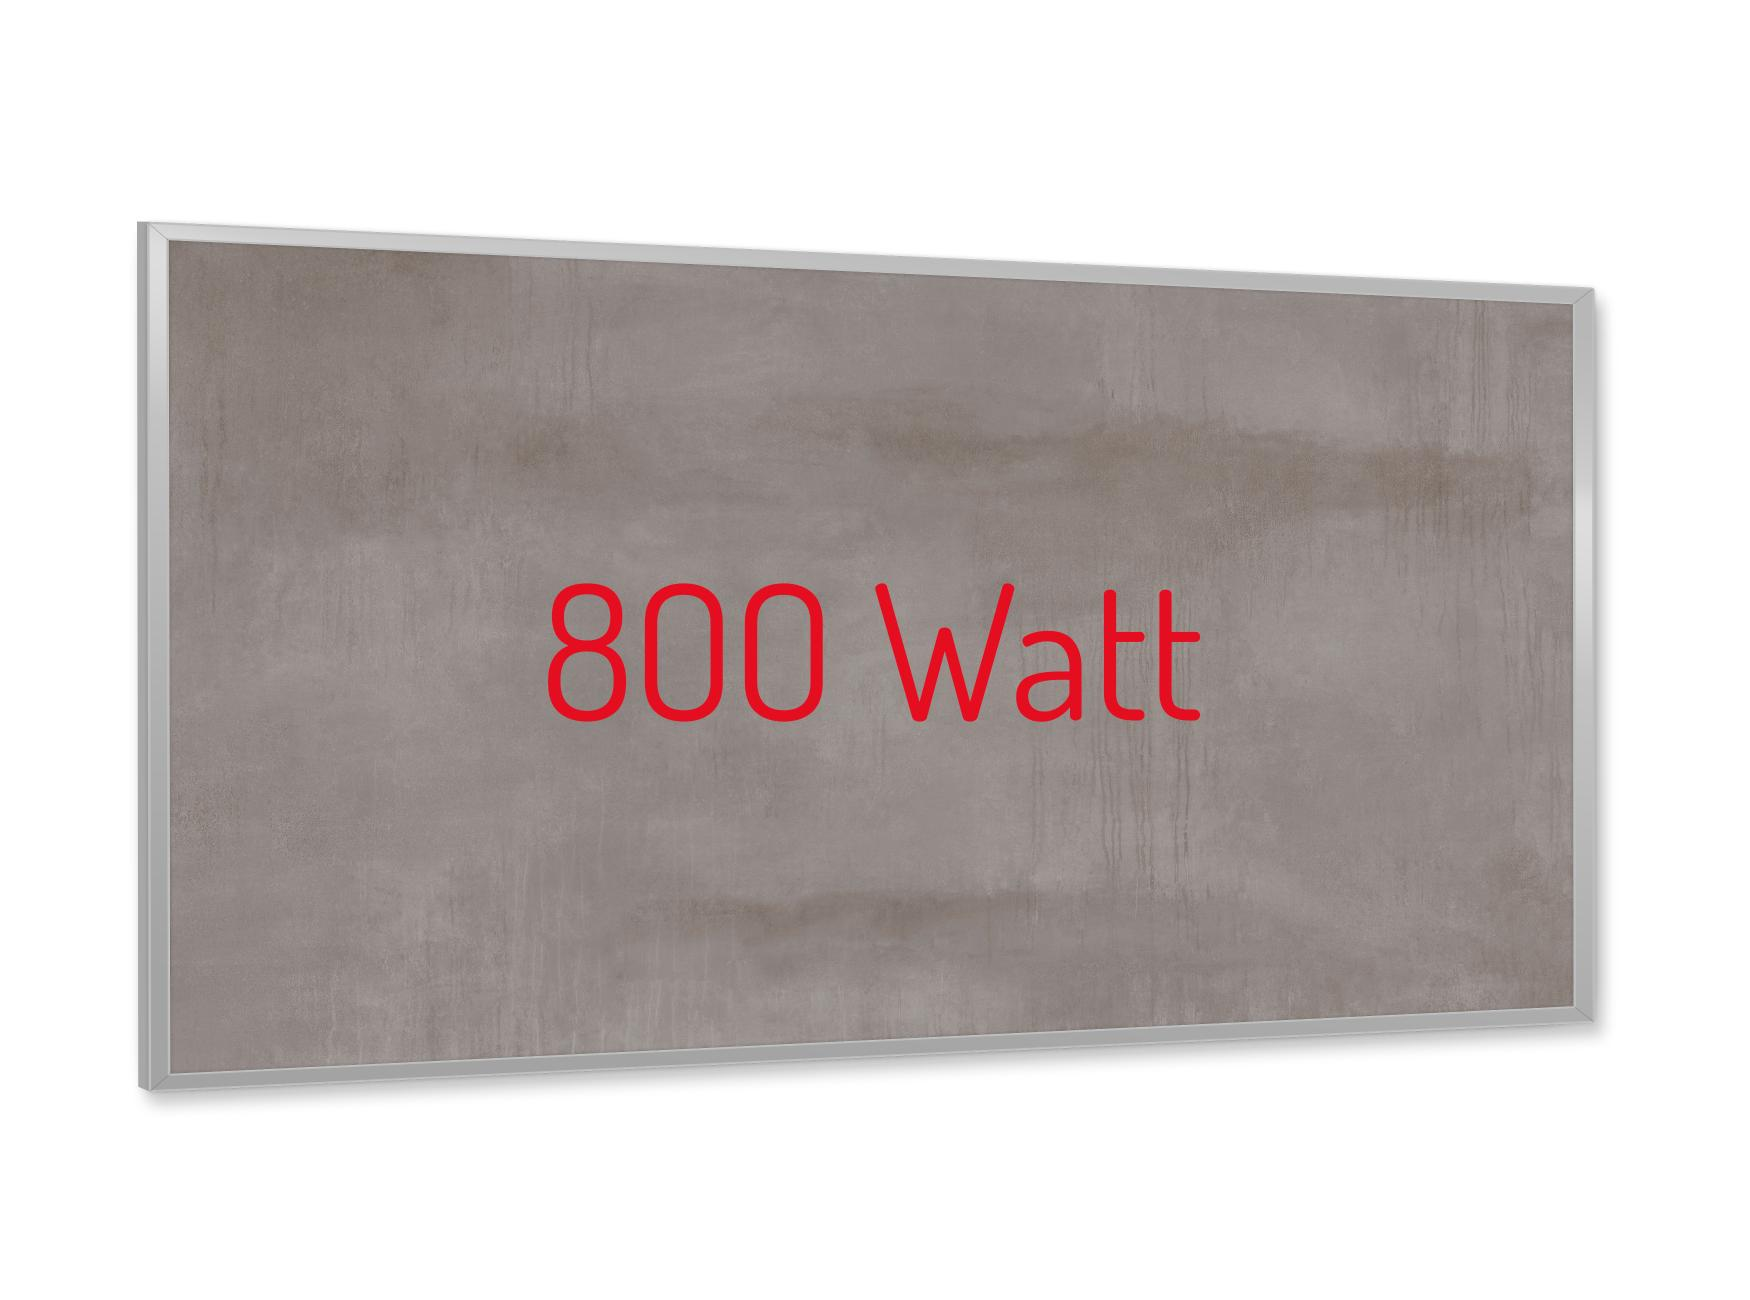 PowerSun Keramik Struktur Paris 800 Watt 60x120cm